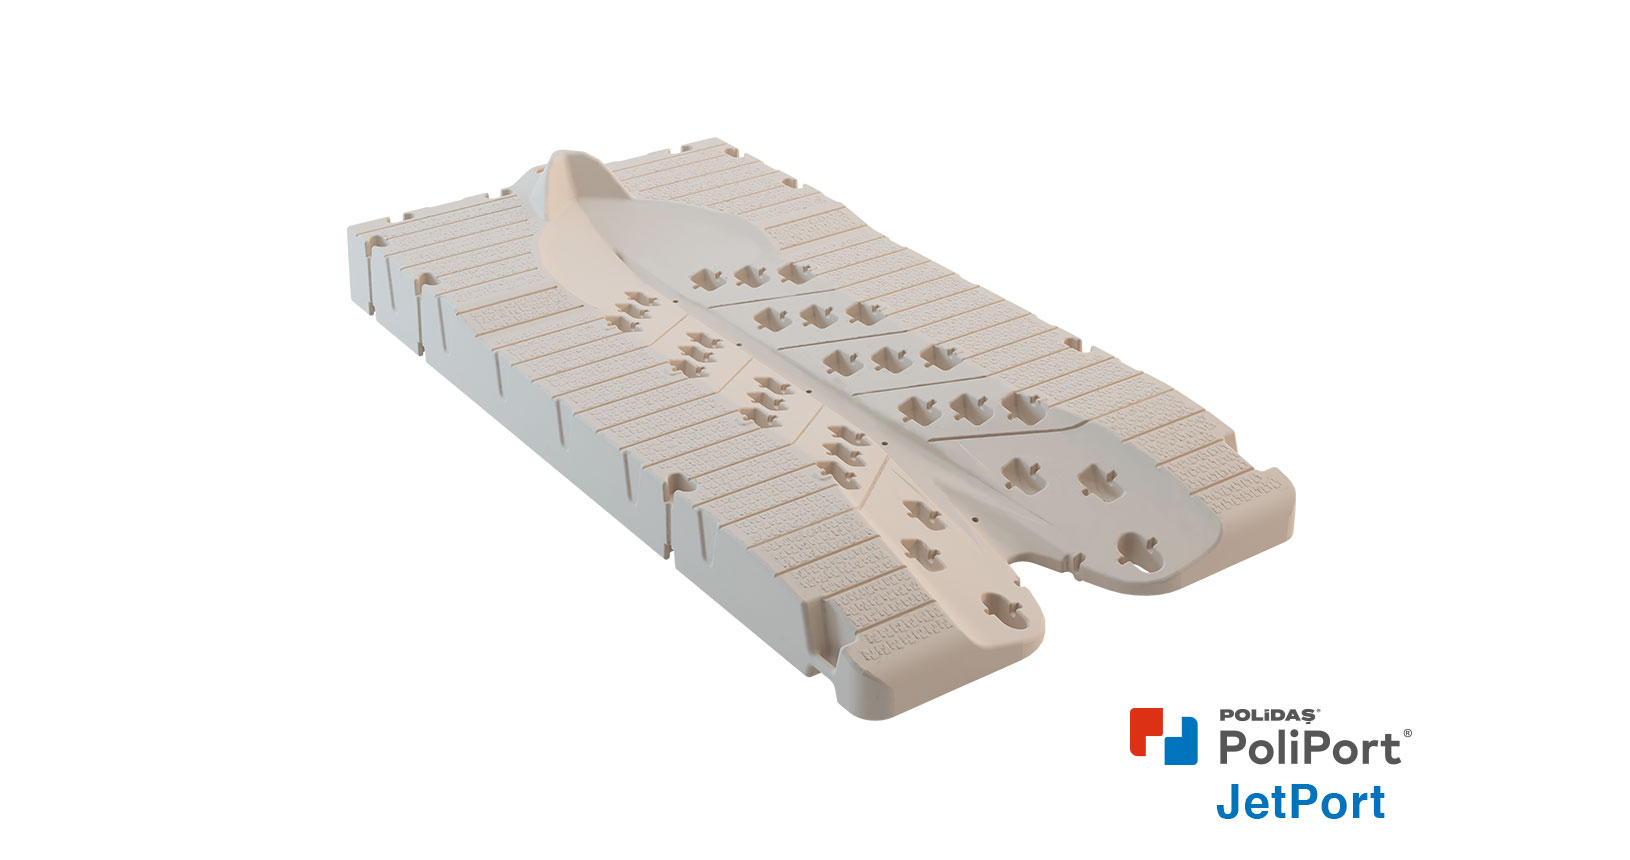 polietilen-jetski-parki-platform-1